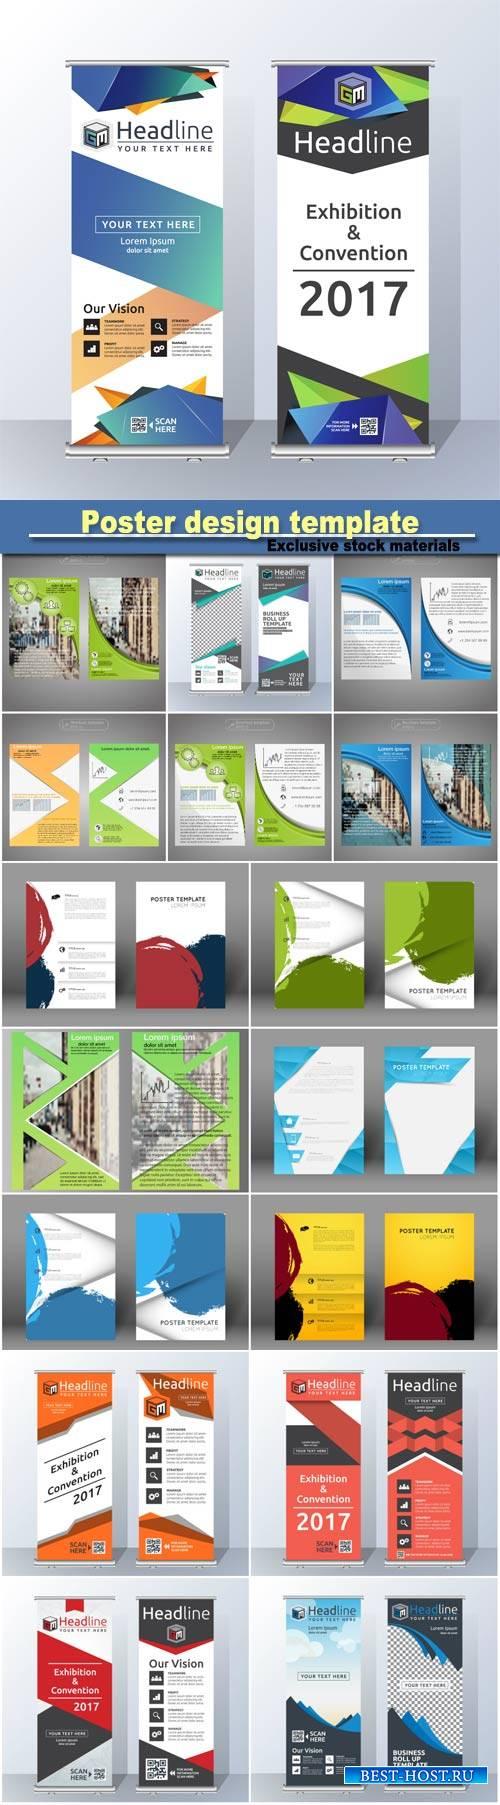 Poster design template, roll up banner template design